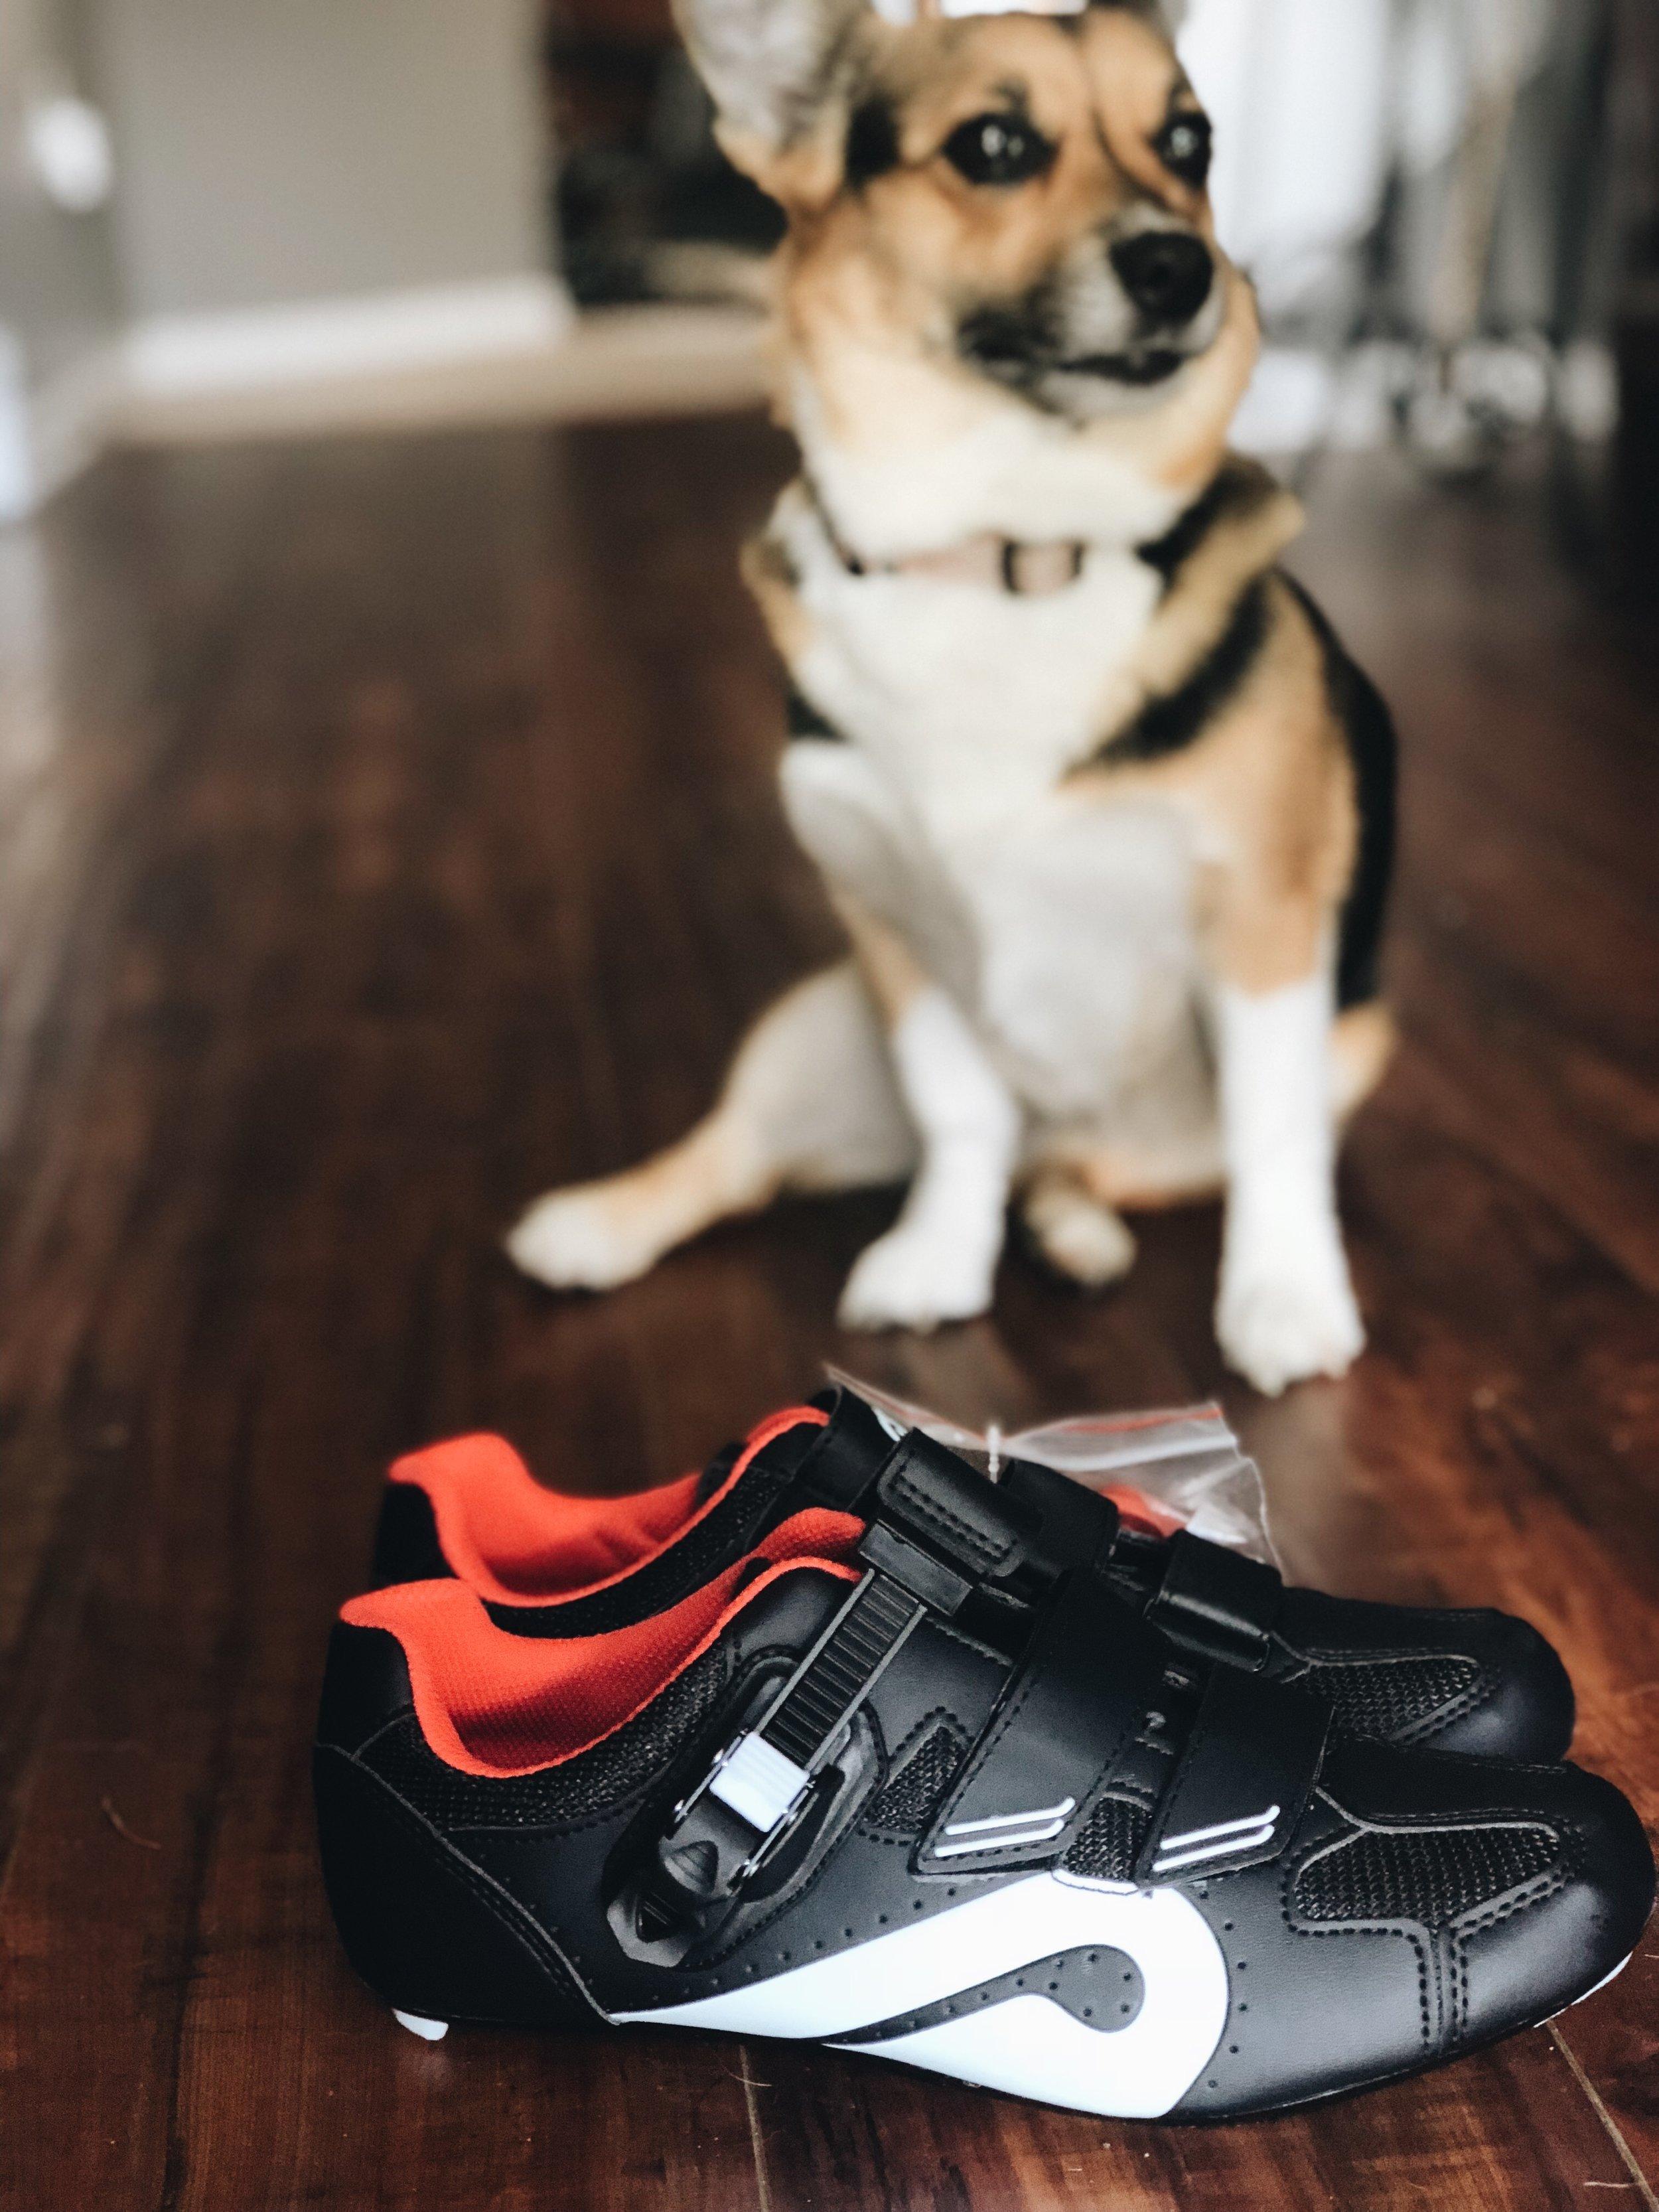 Peloton Spin Shoes